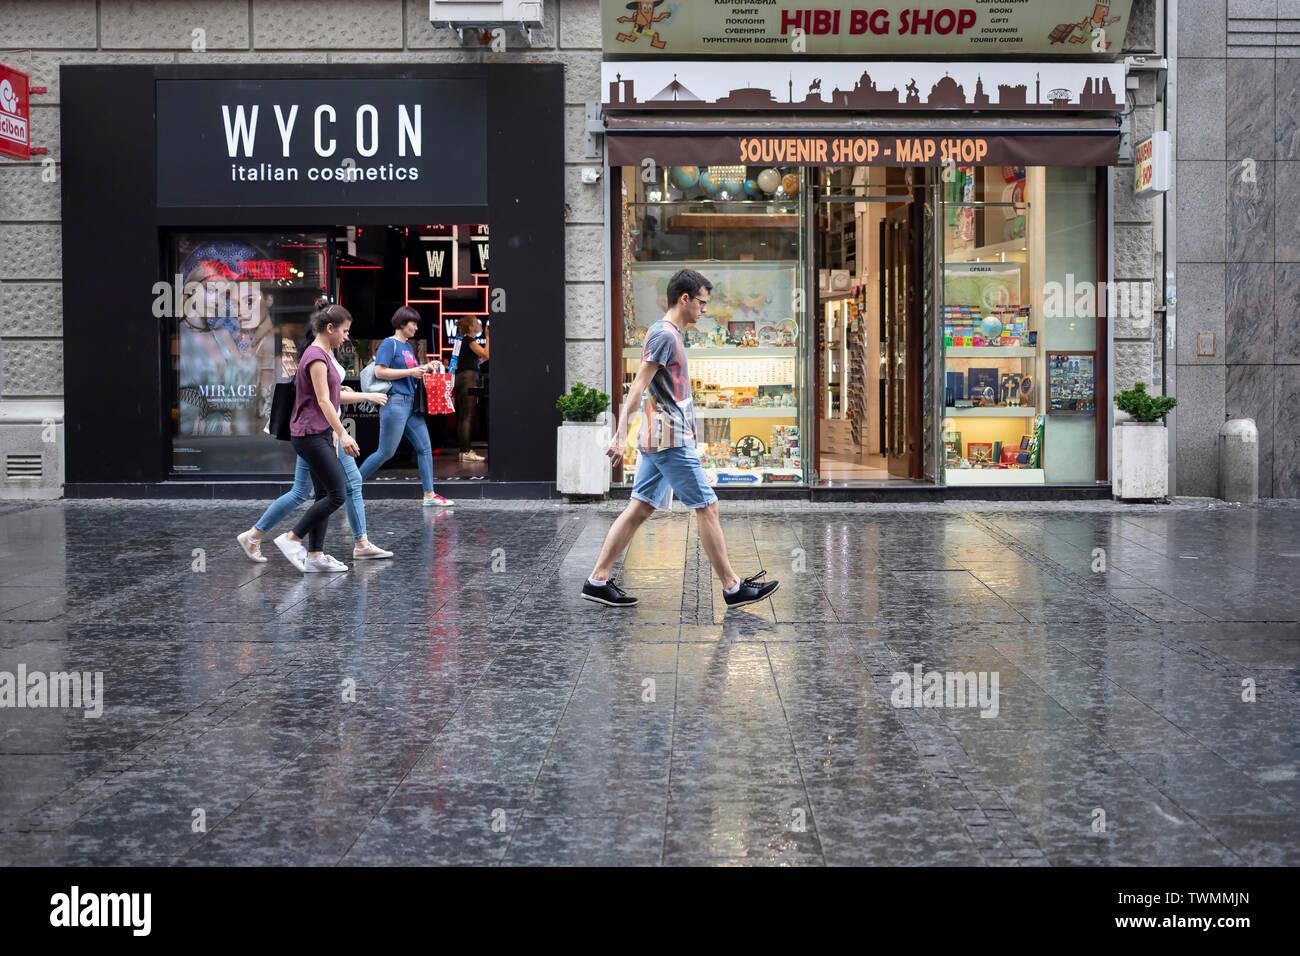 Belgrade, Serbia, June 18th 2019: Urban scene with people walking down the Knez Mihailova Street during the light rain - Stock Image